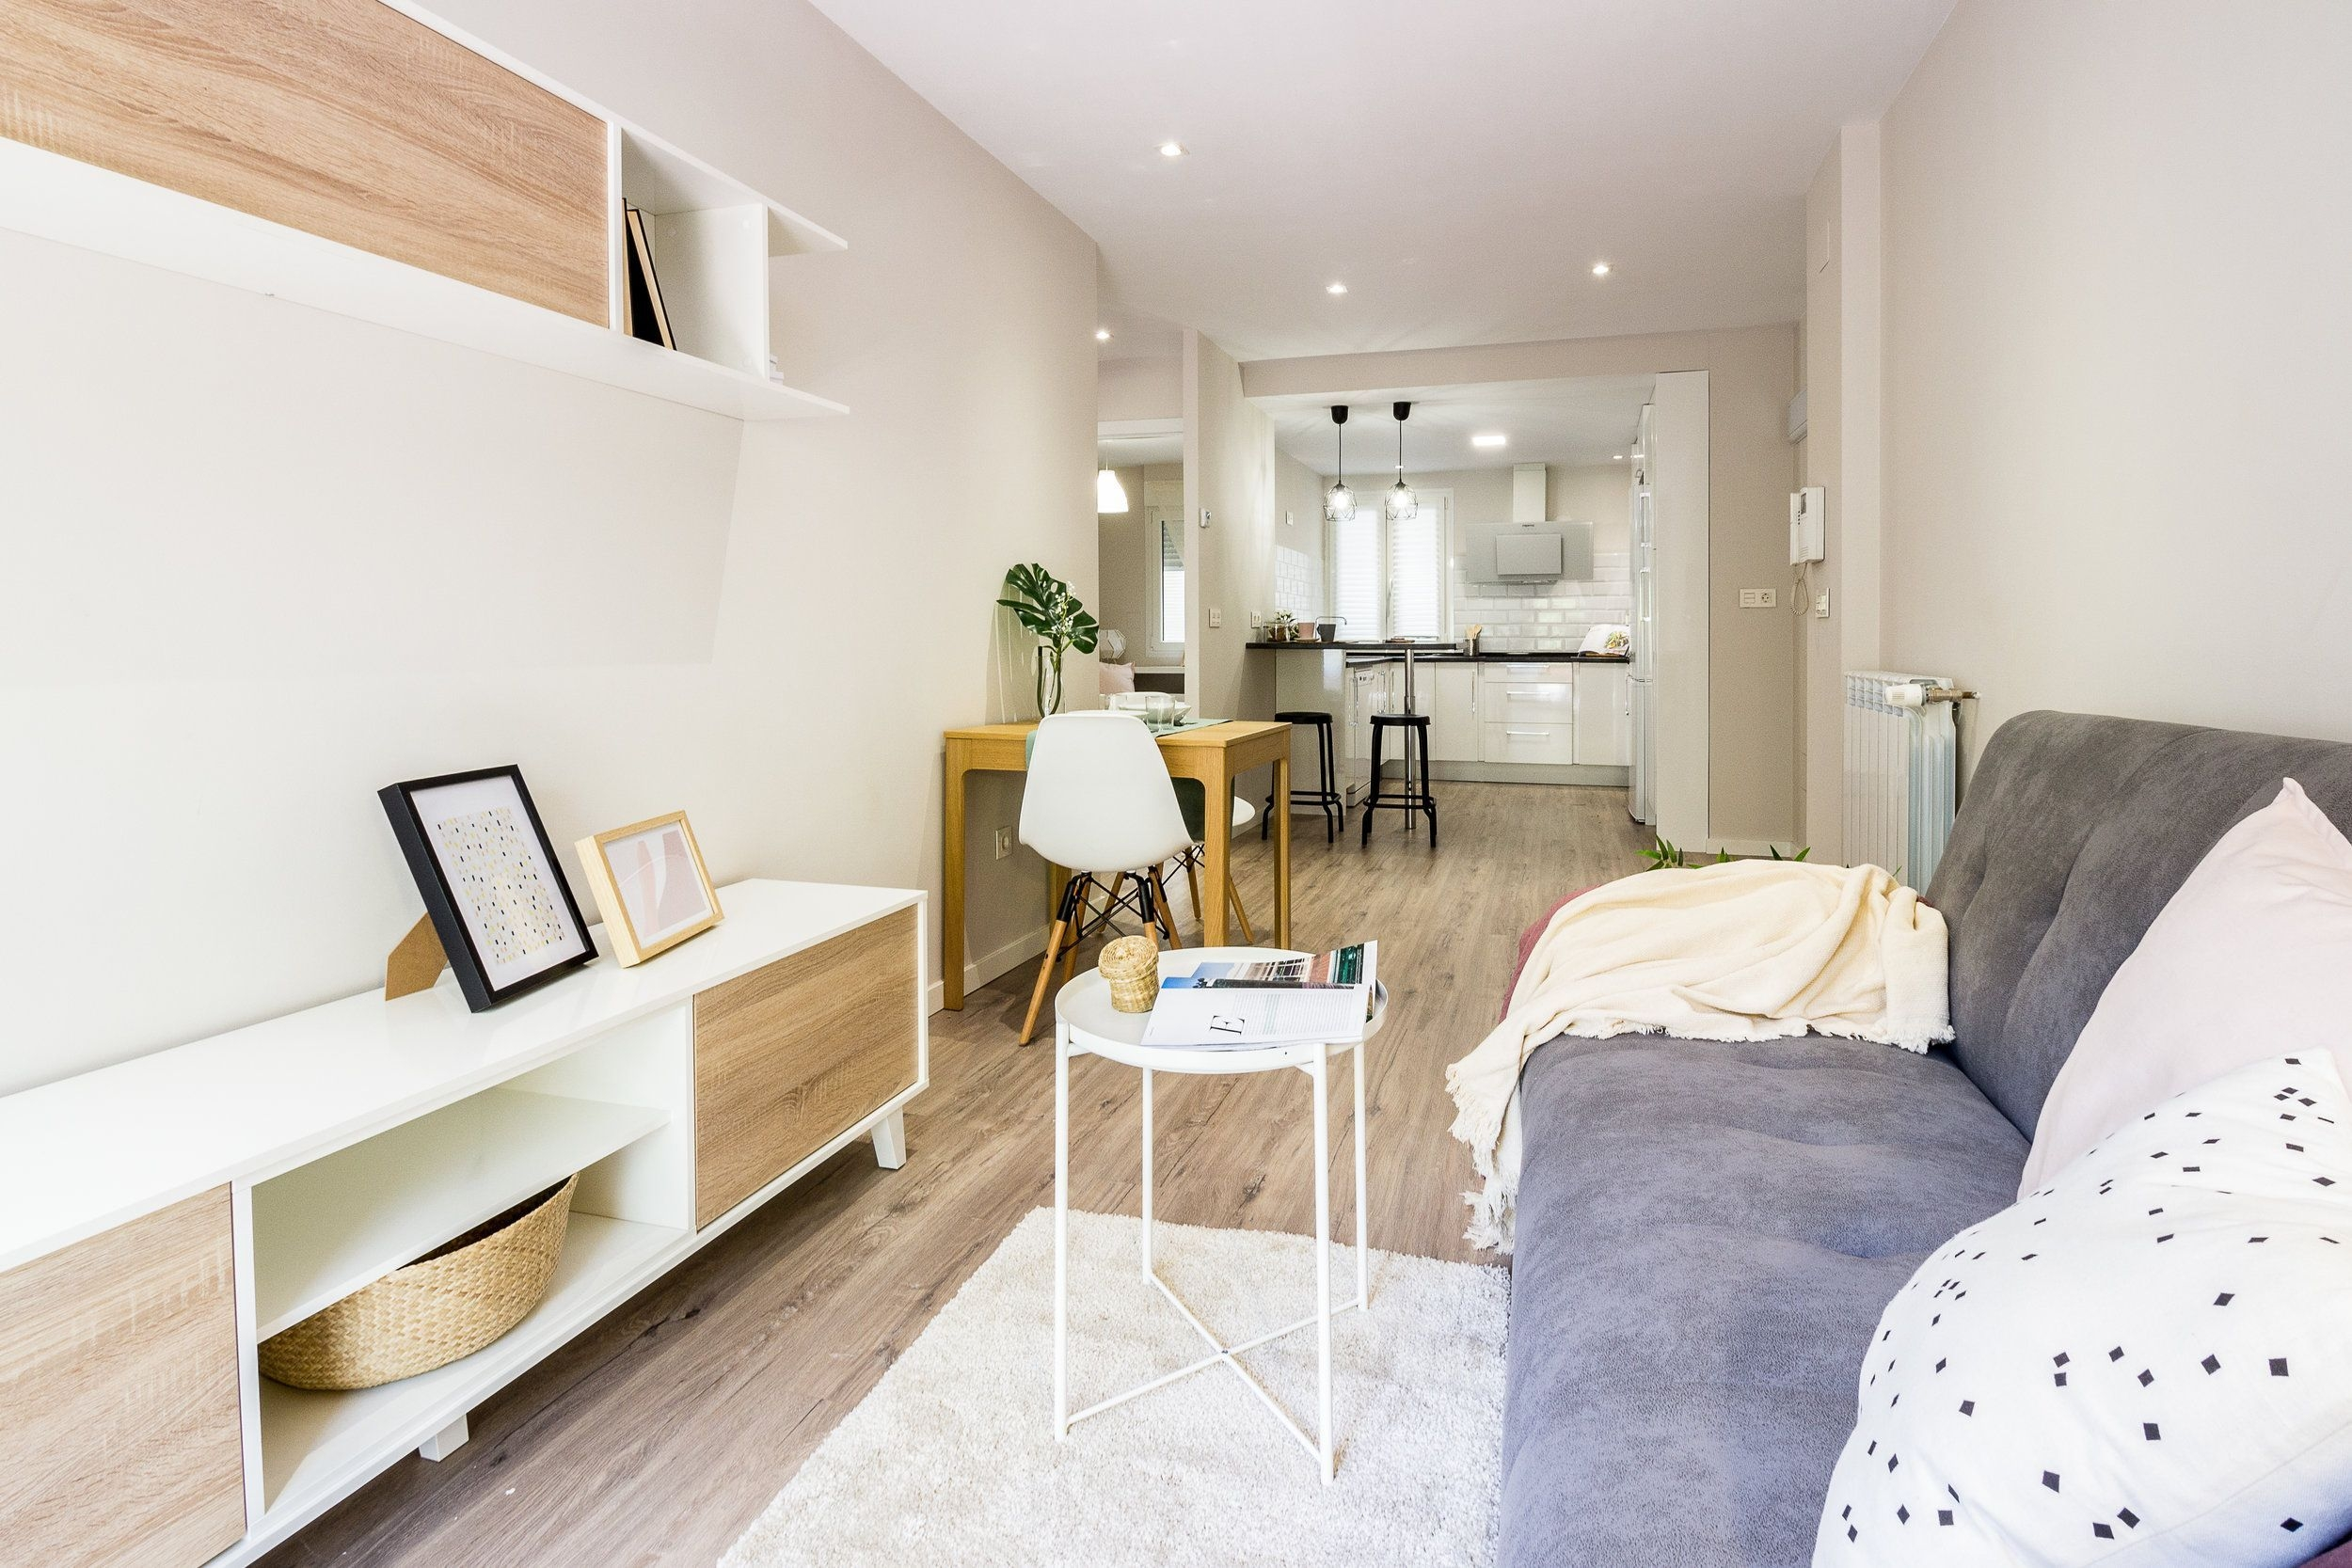 Astonishing Rental Apartment Decorating Ideas 48